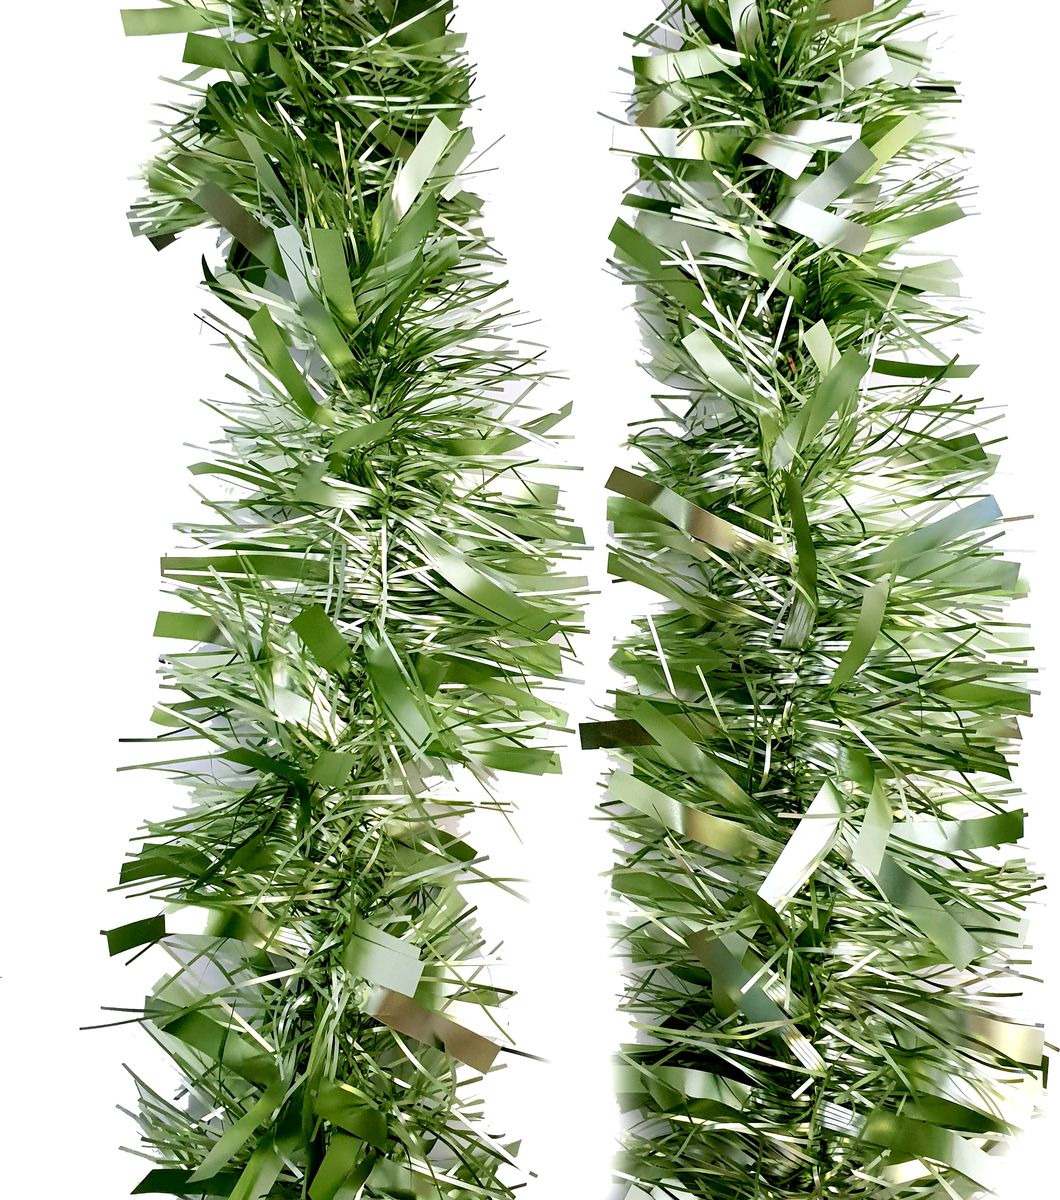 Мишура новогодняя Magic Time, цвет: оливковый, 9 х 200 см. 78800 цены онлайн